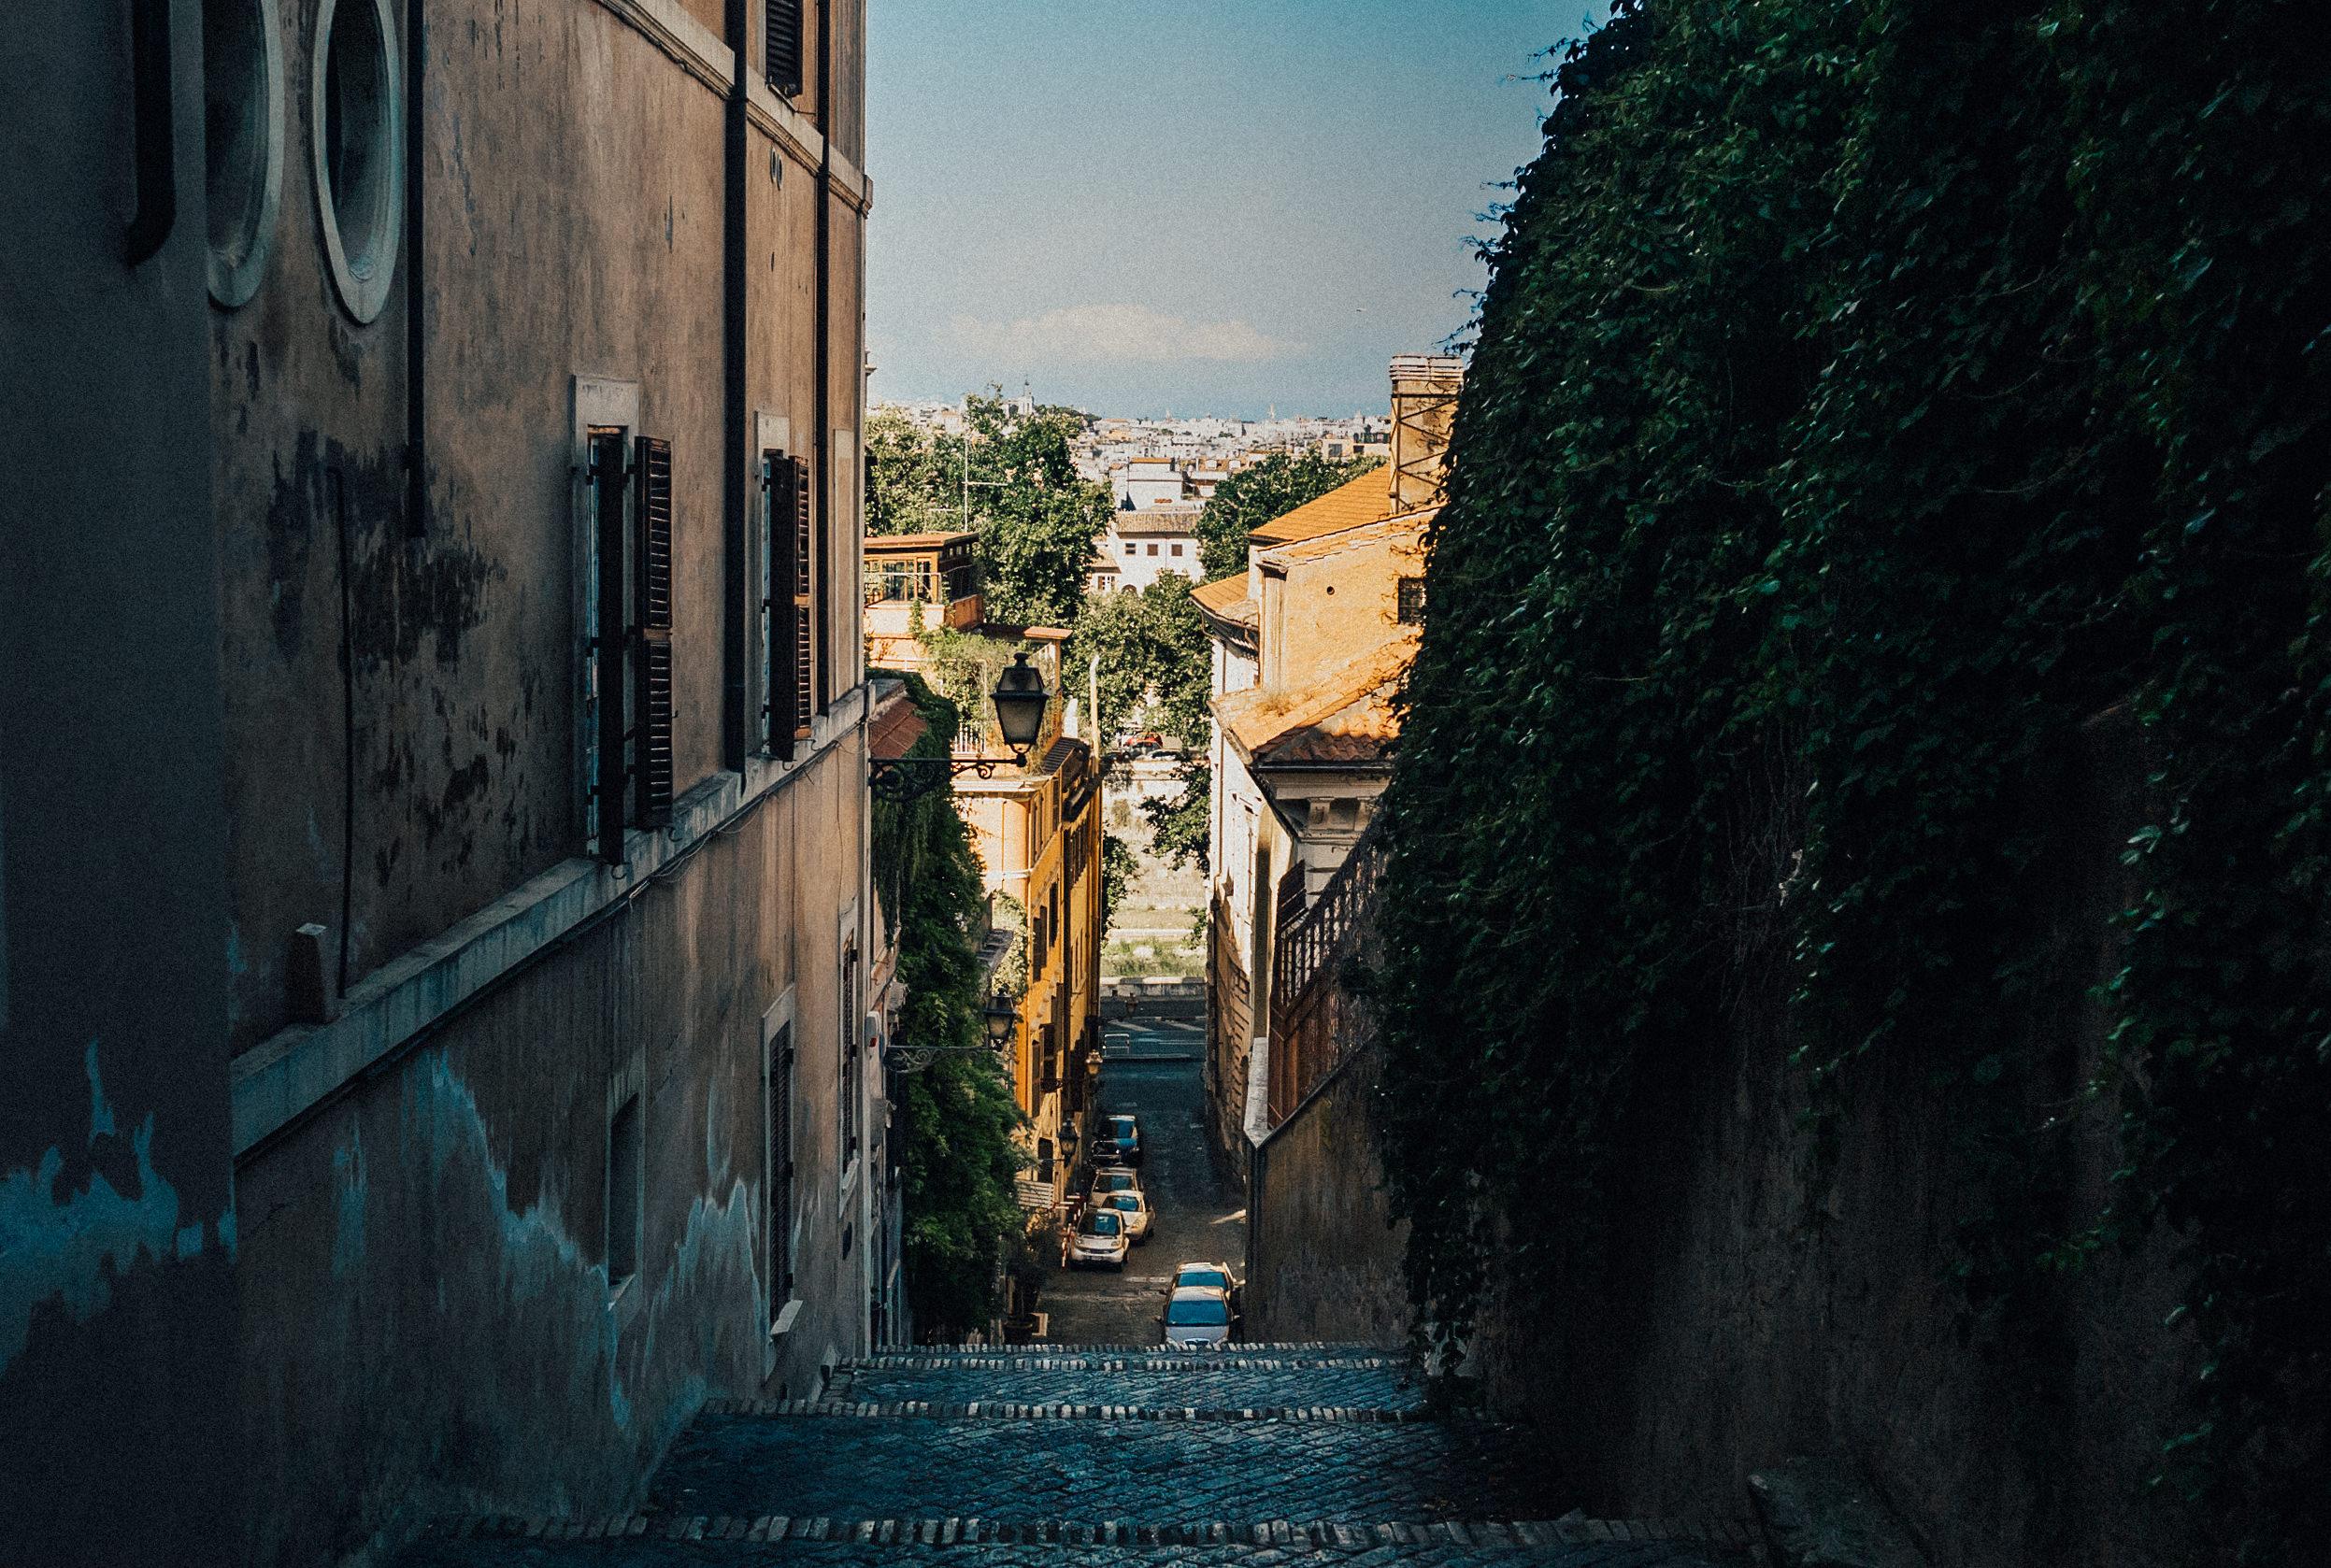 italy_travel_photography03.jpg